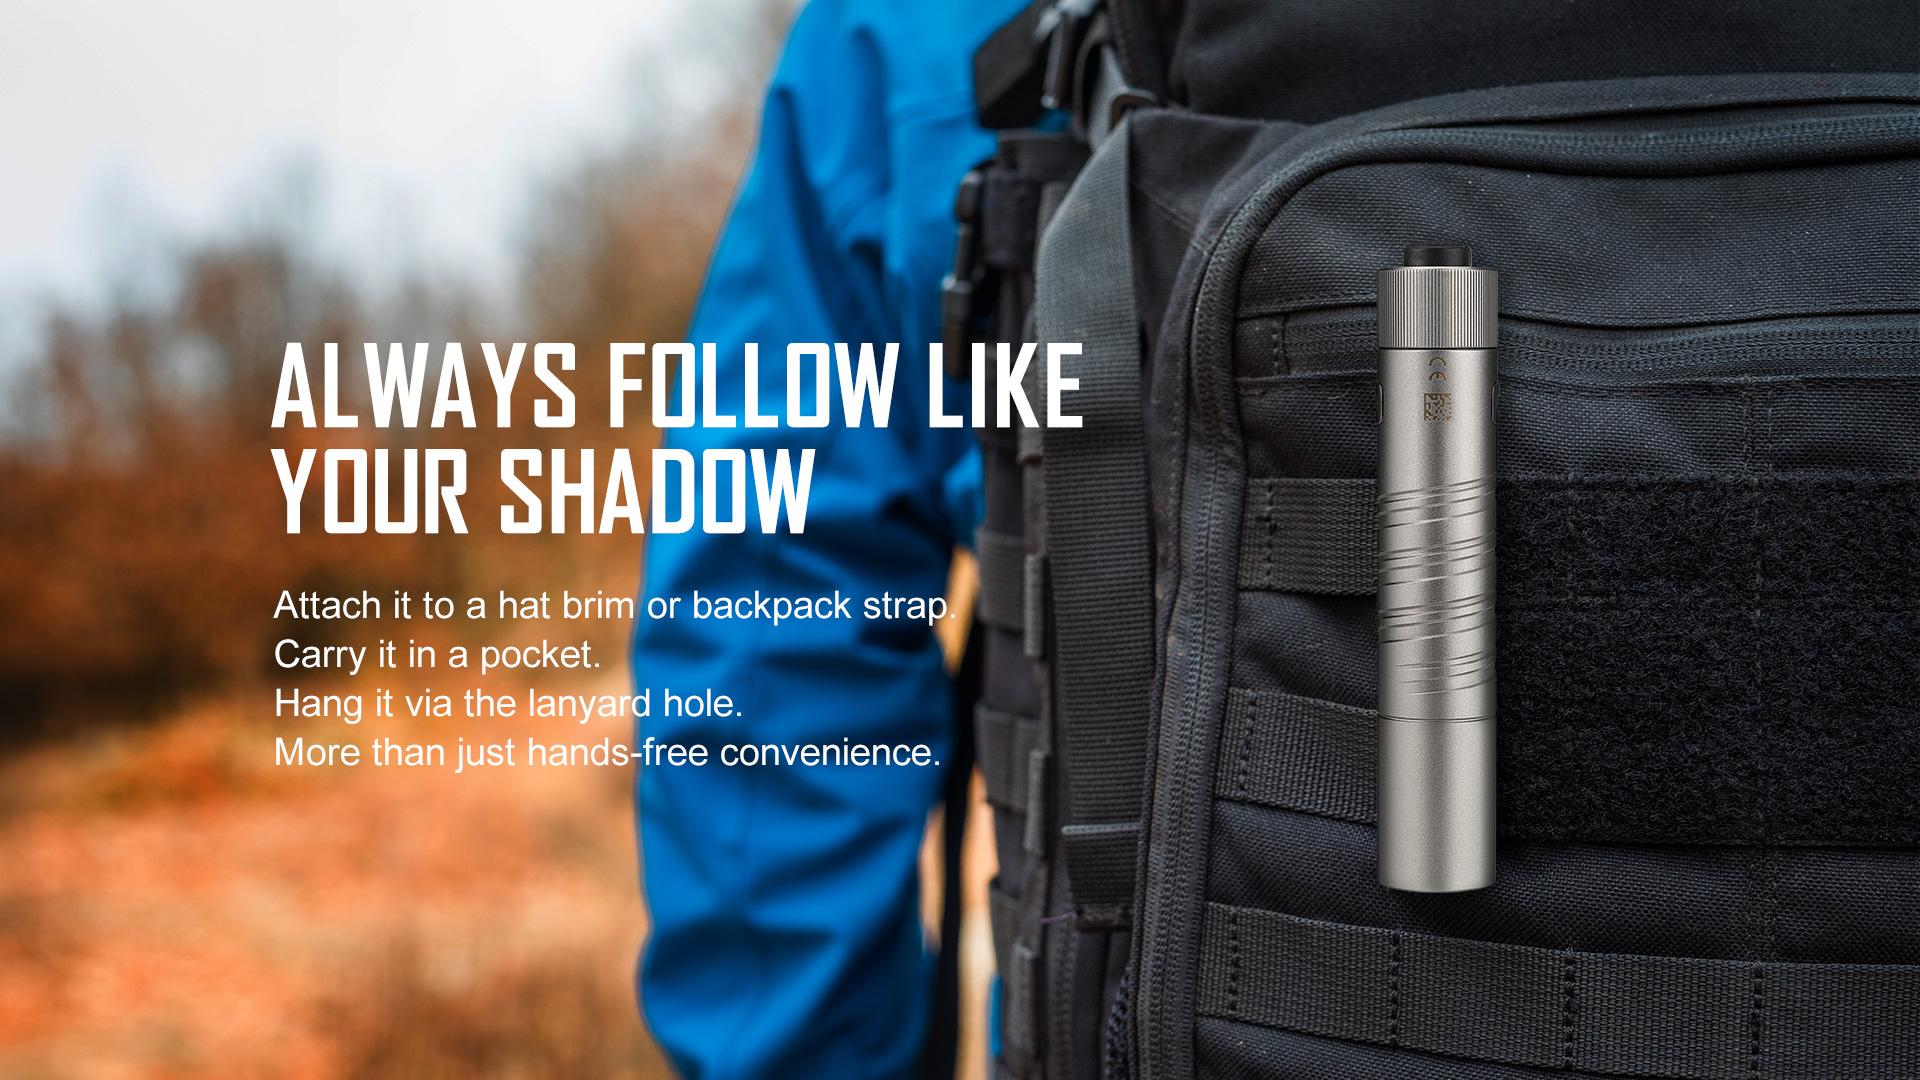 Pocket LED flashlight with two-way pocket clip